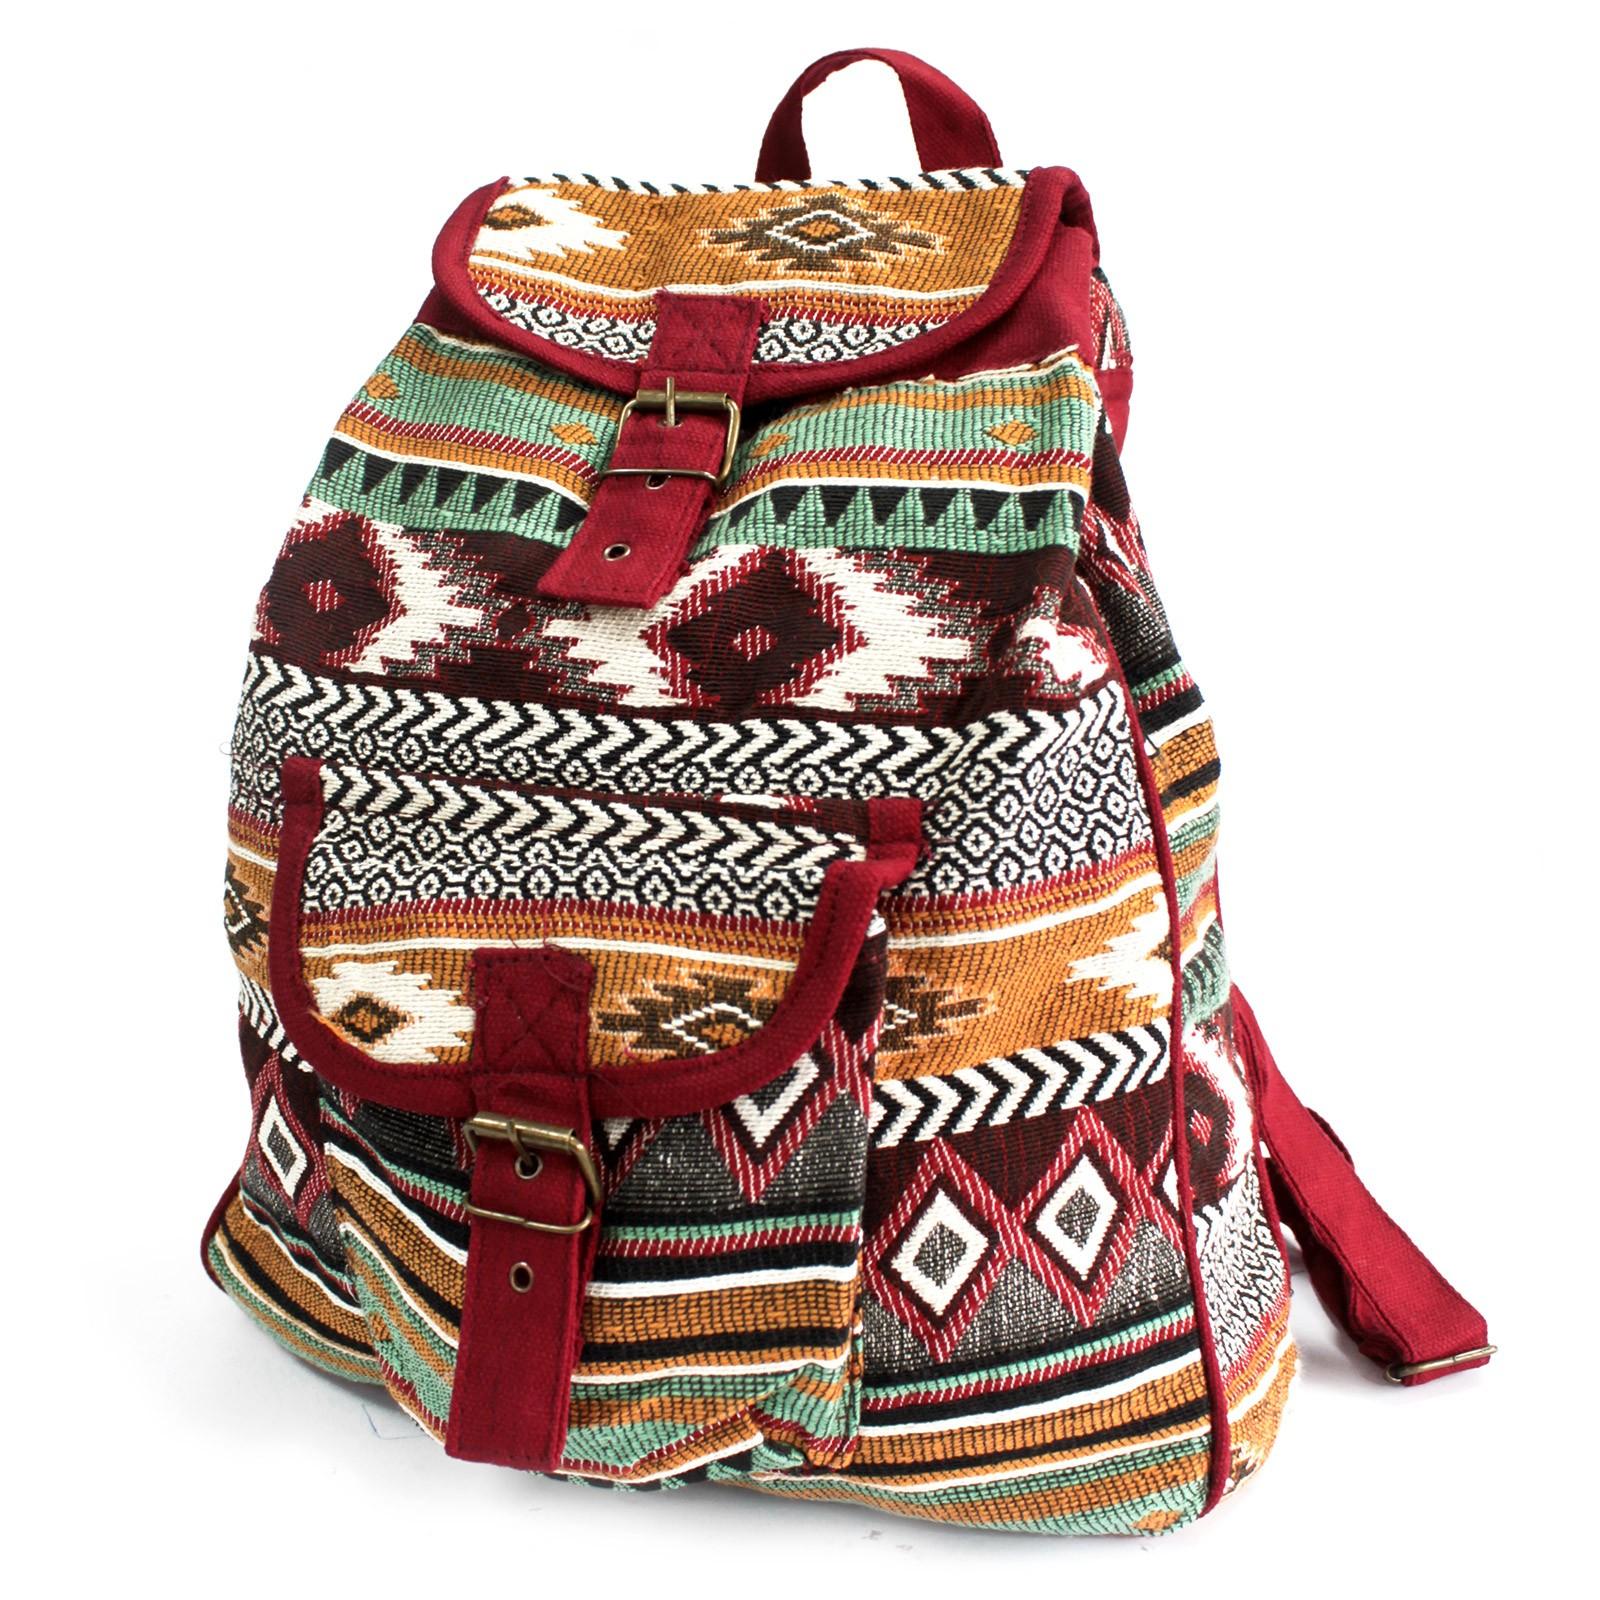 Jacquard Bag Chocolate Backpack